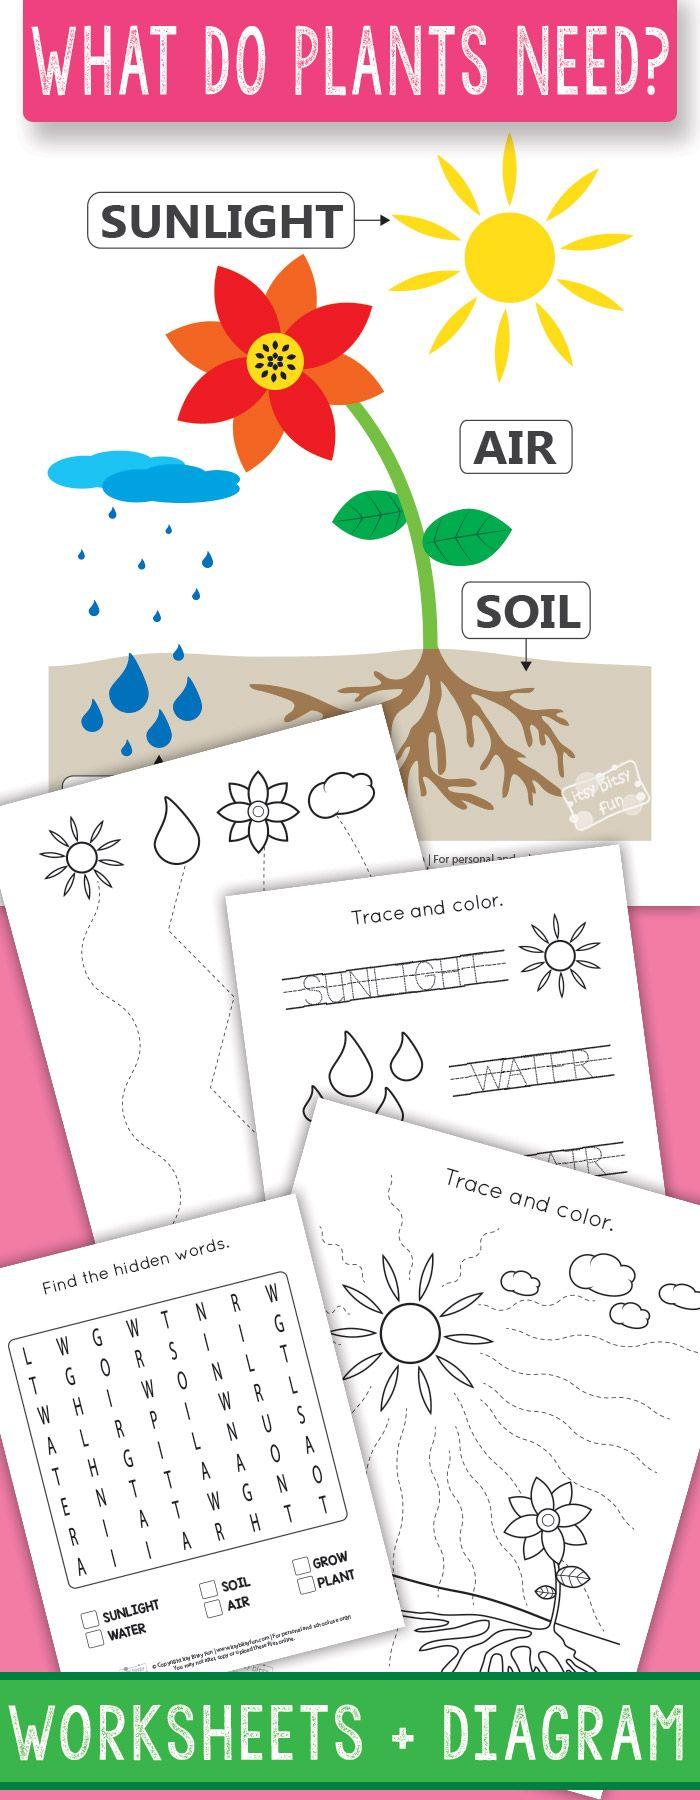 What Do Plants Need To Grow Worksheets Itsybitsyfun Com Plants Kindergarten Plant Activities Plants Worksheets [ 1800 x 700 Pixel ]